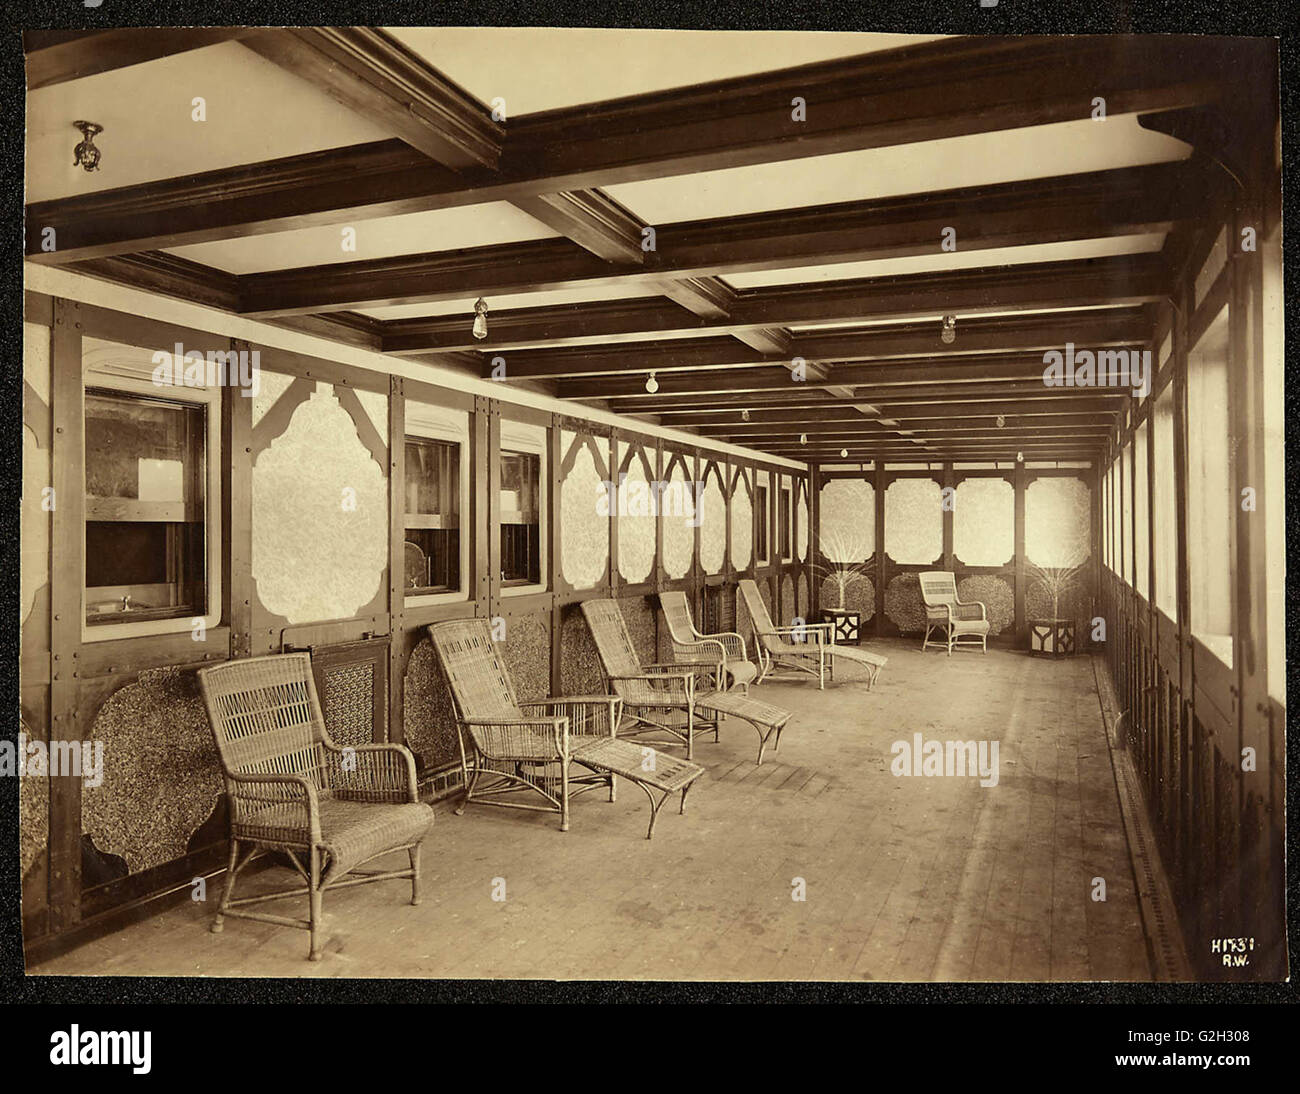 Inside Titanic 2: Titanic Interior Stock Photos & Titanic Interior Stock